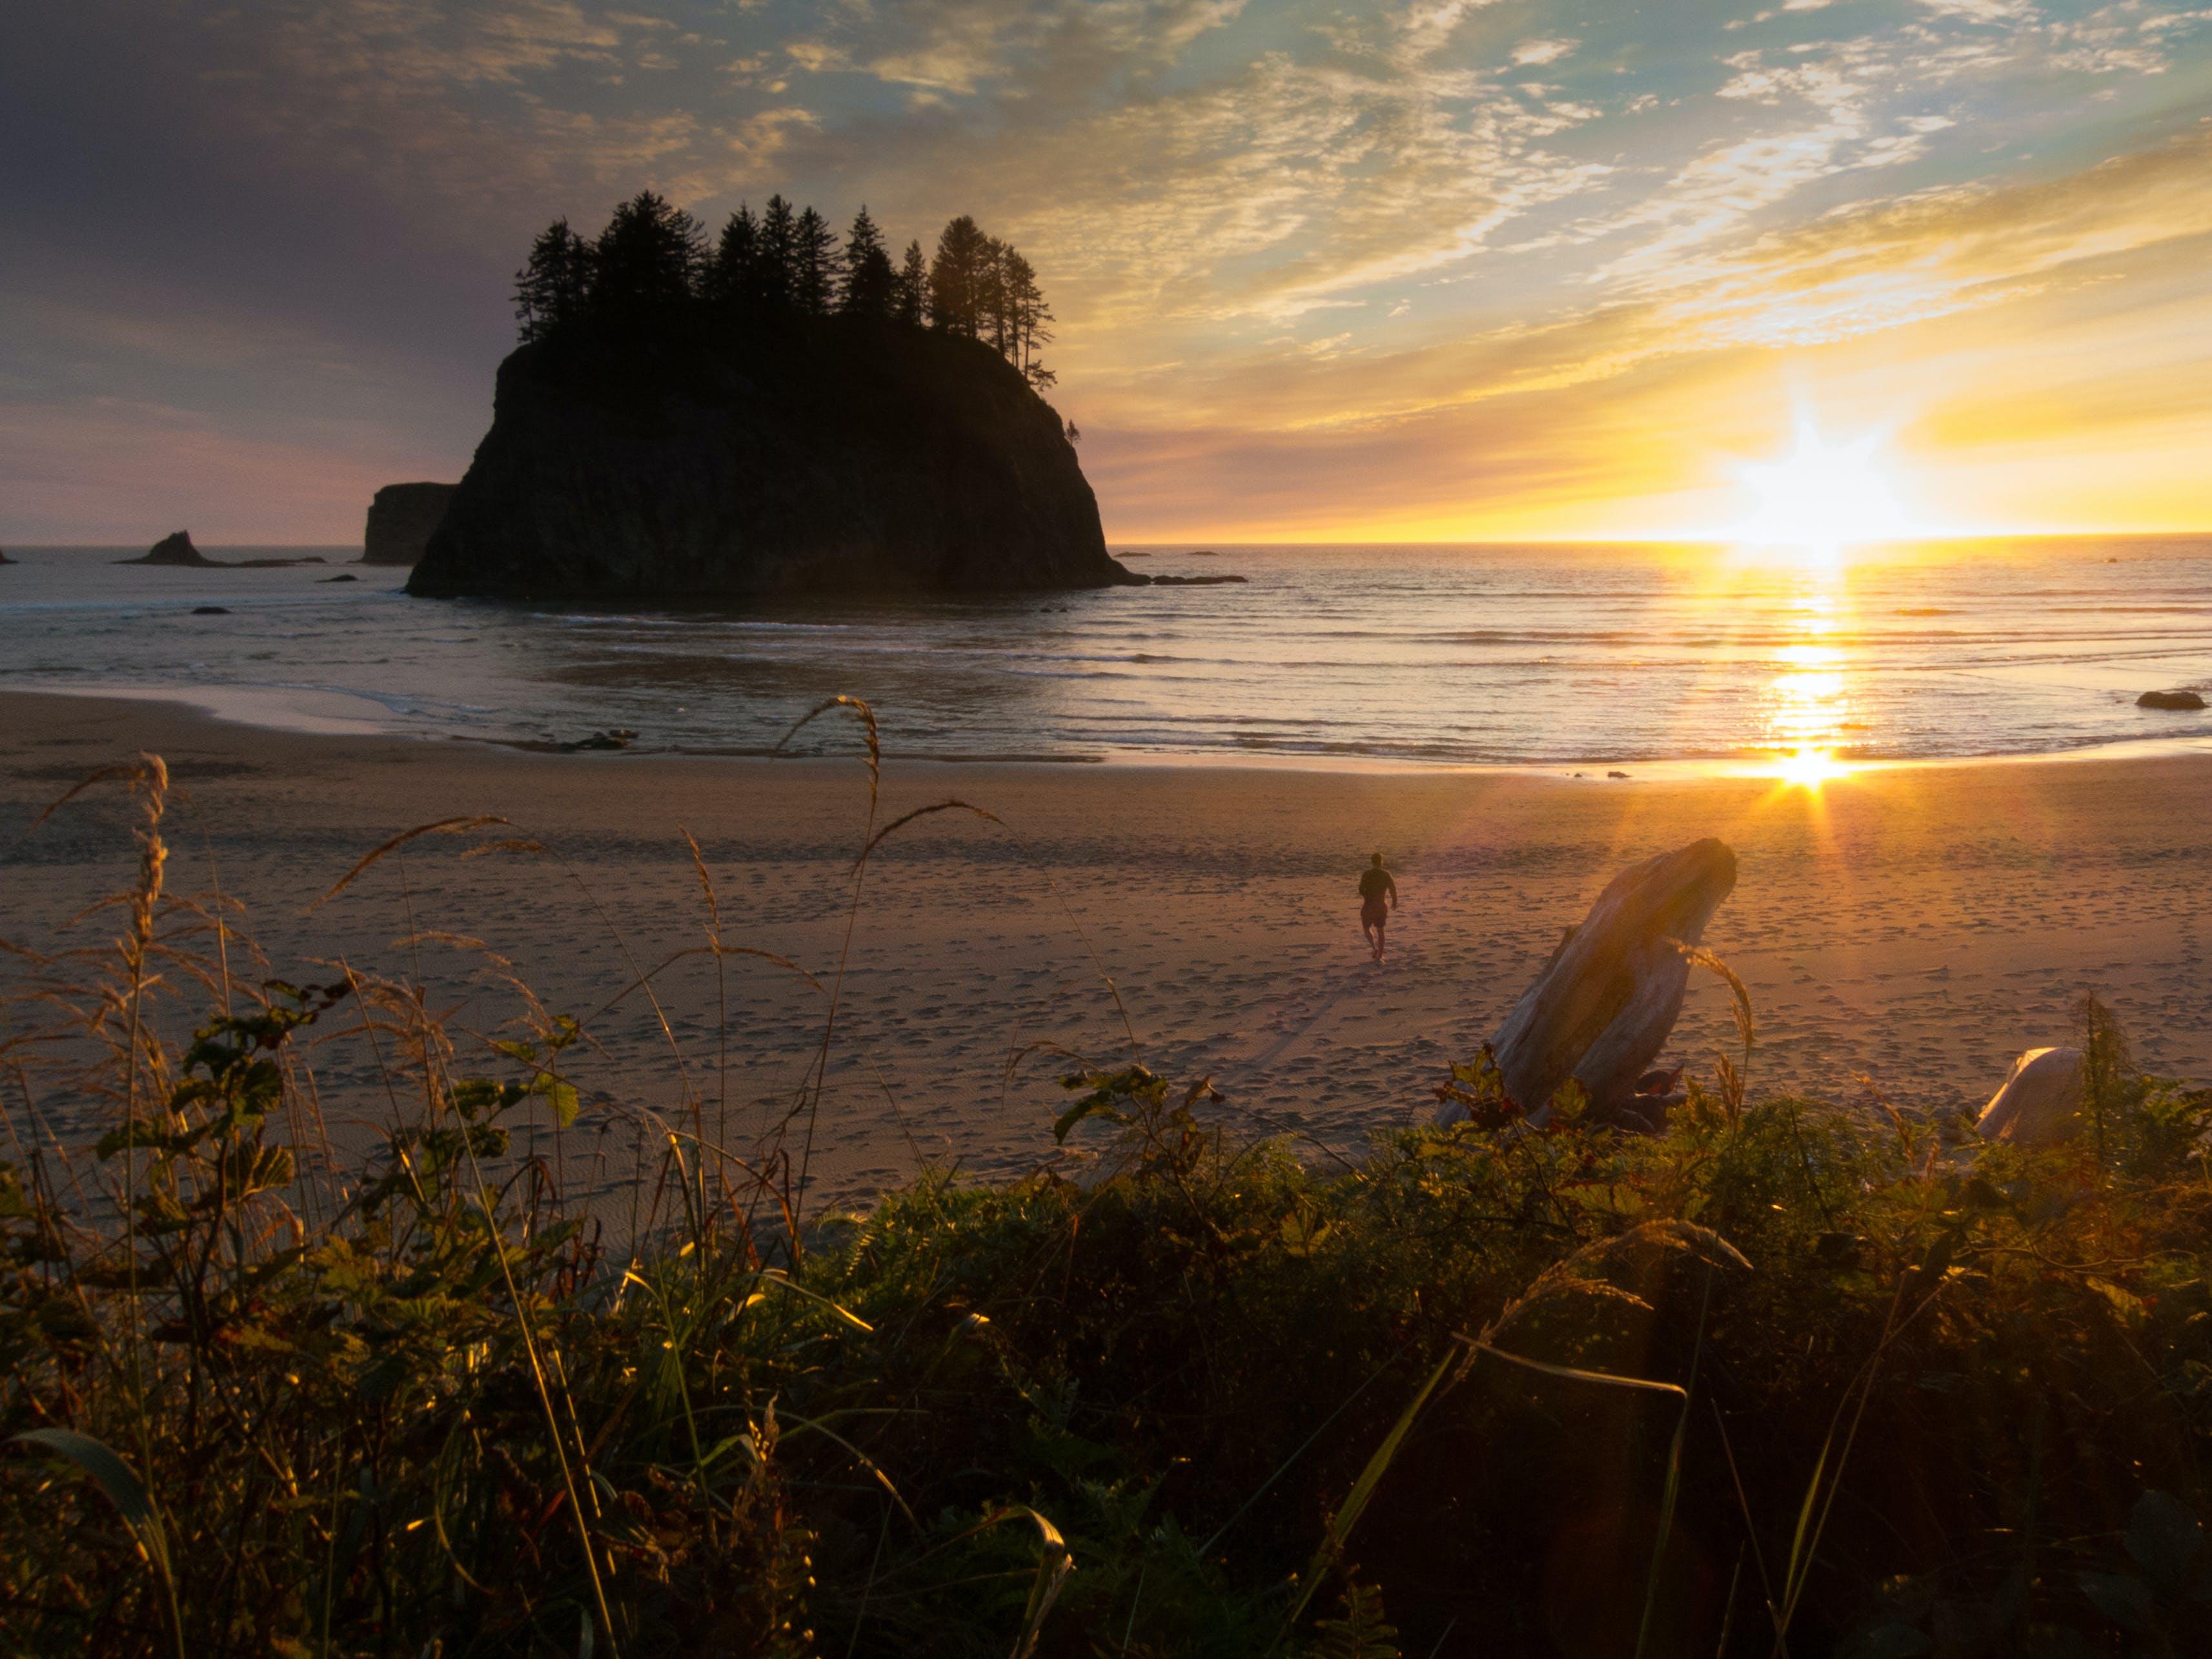 Free stock photo of pacific beach, sunset